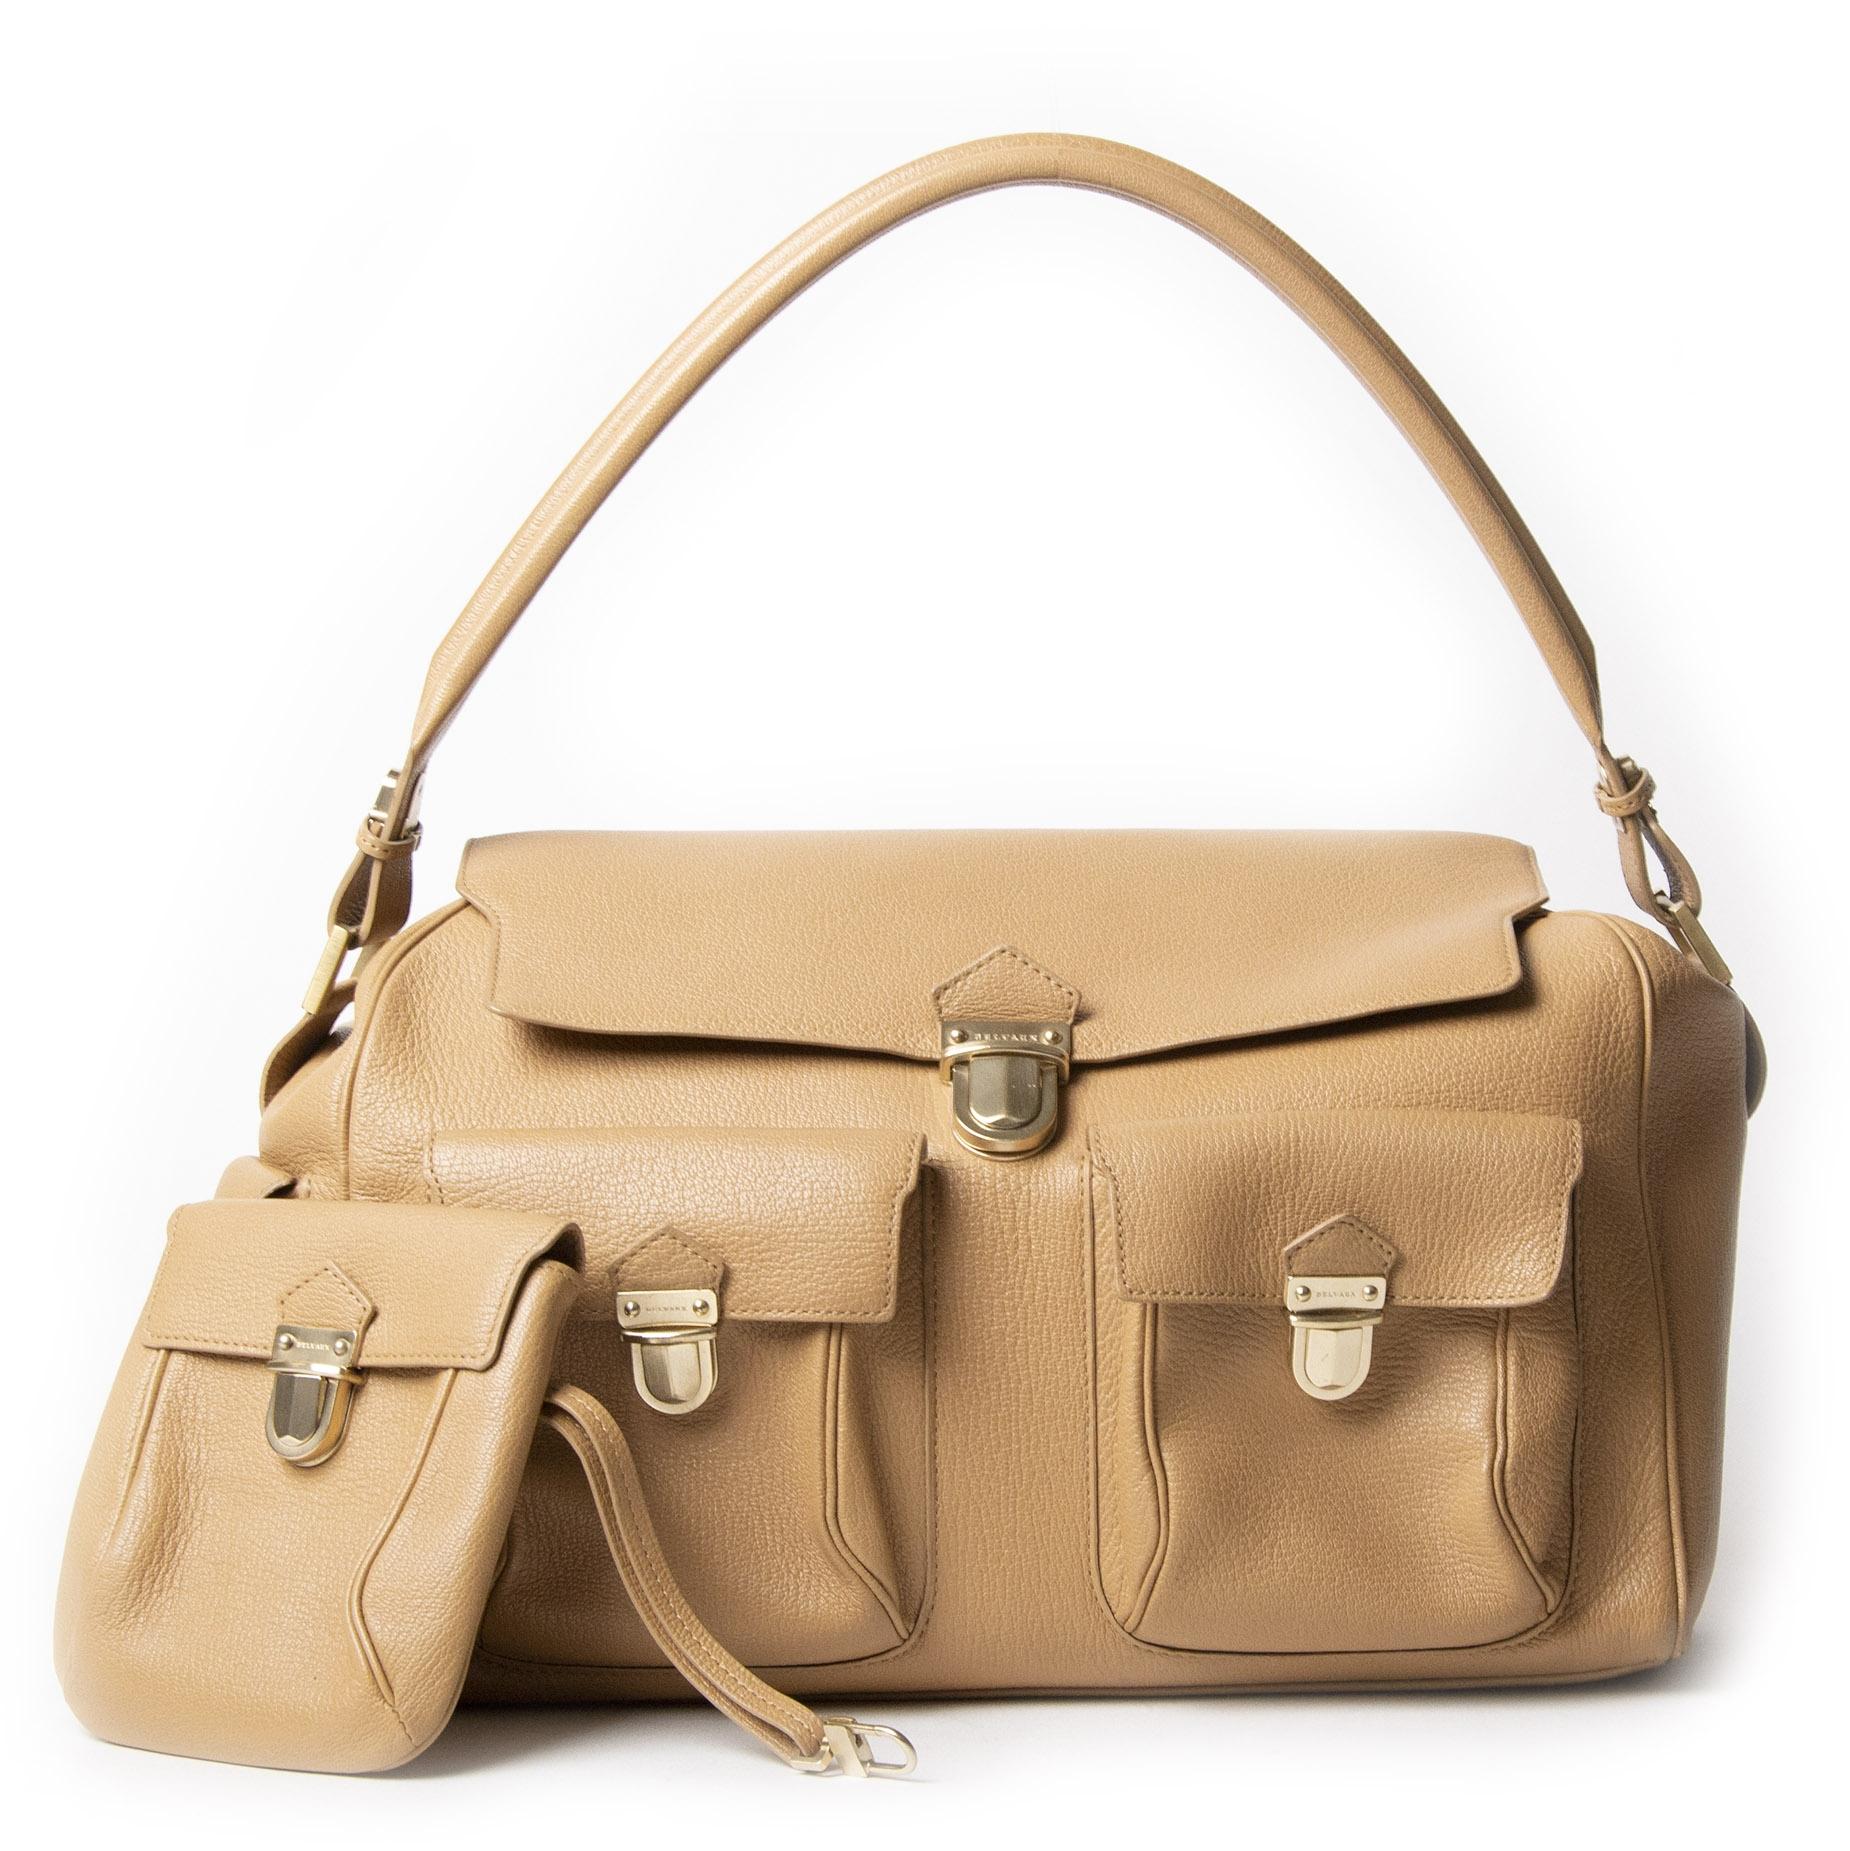 Delvaux Coquin Poches Blush Shoulder Bag